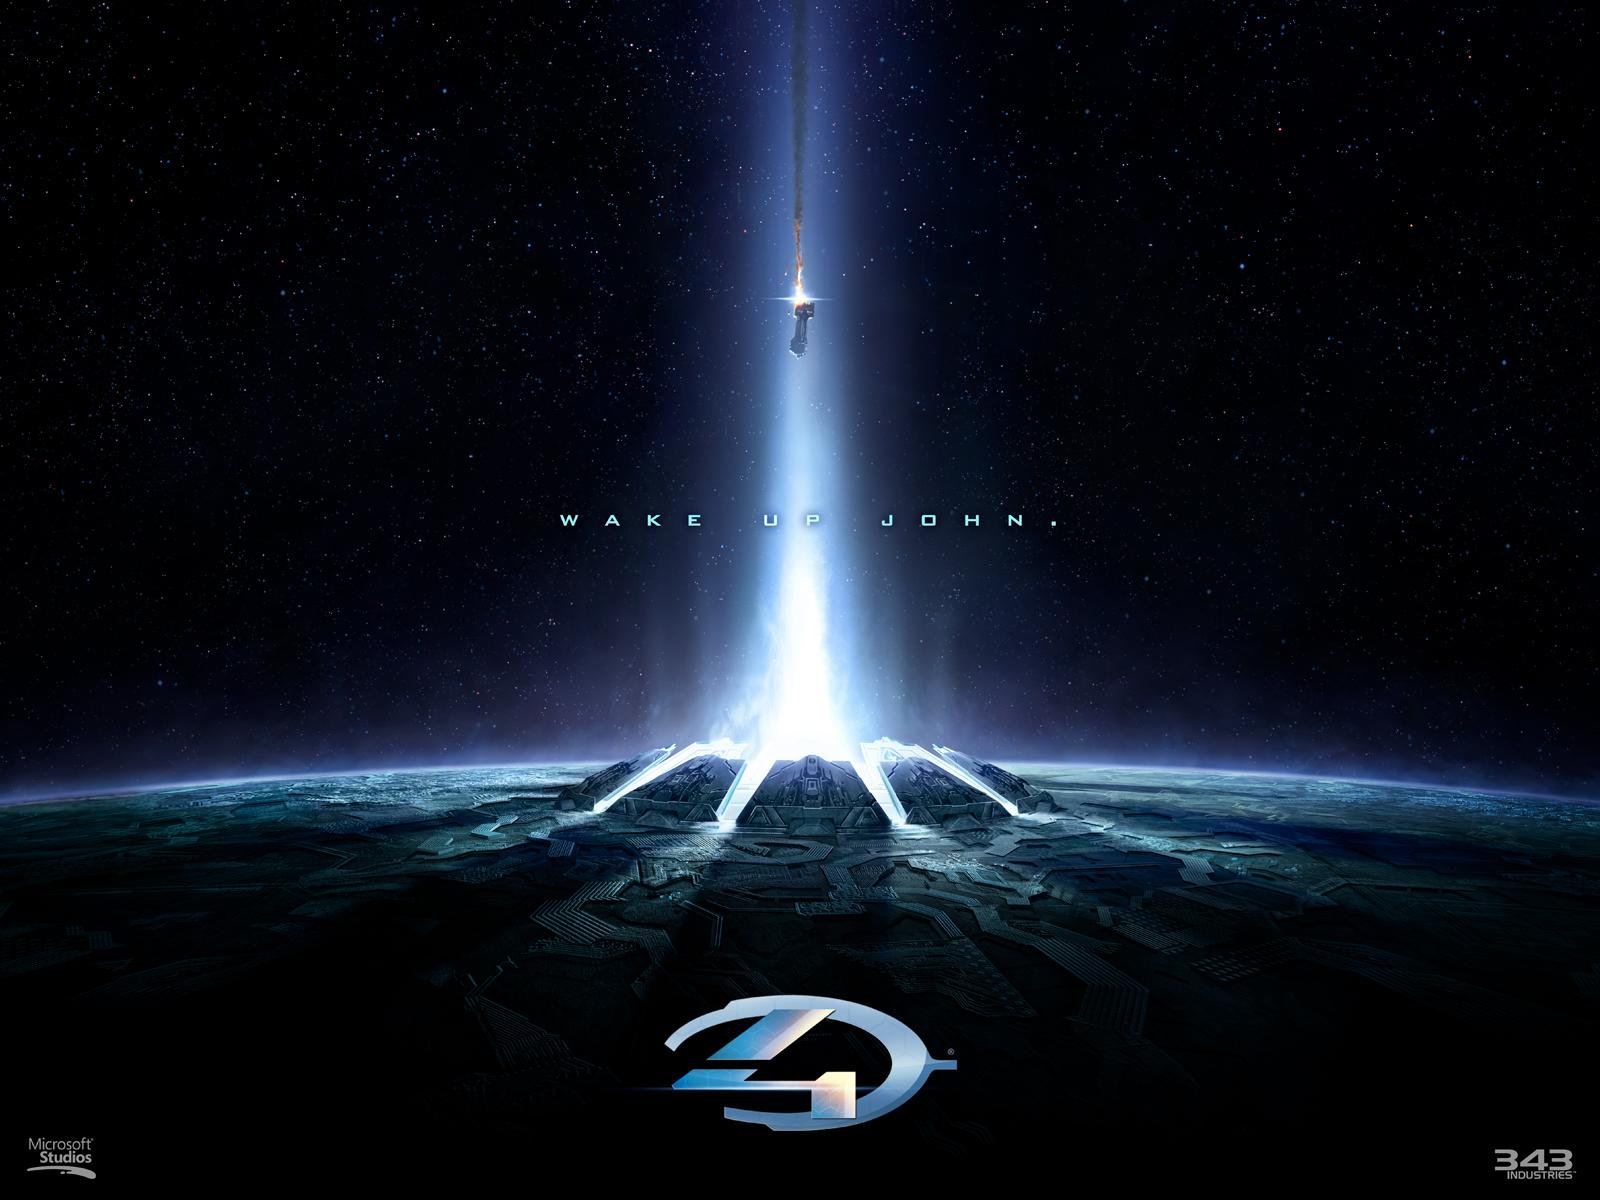 Halo 4ever